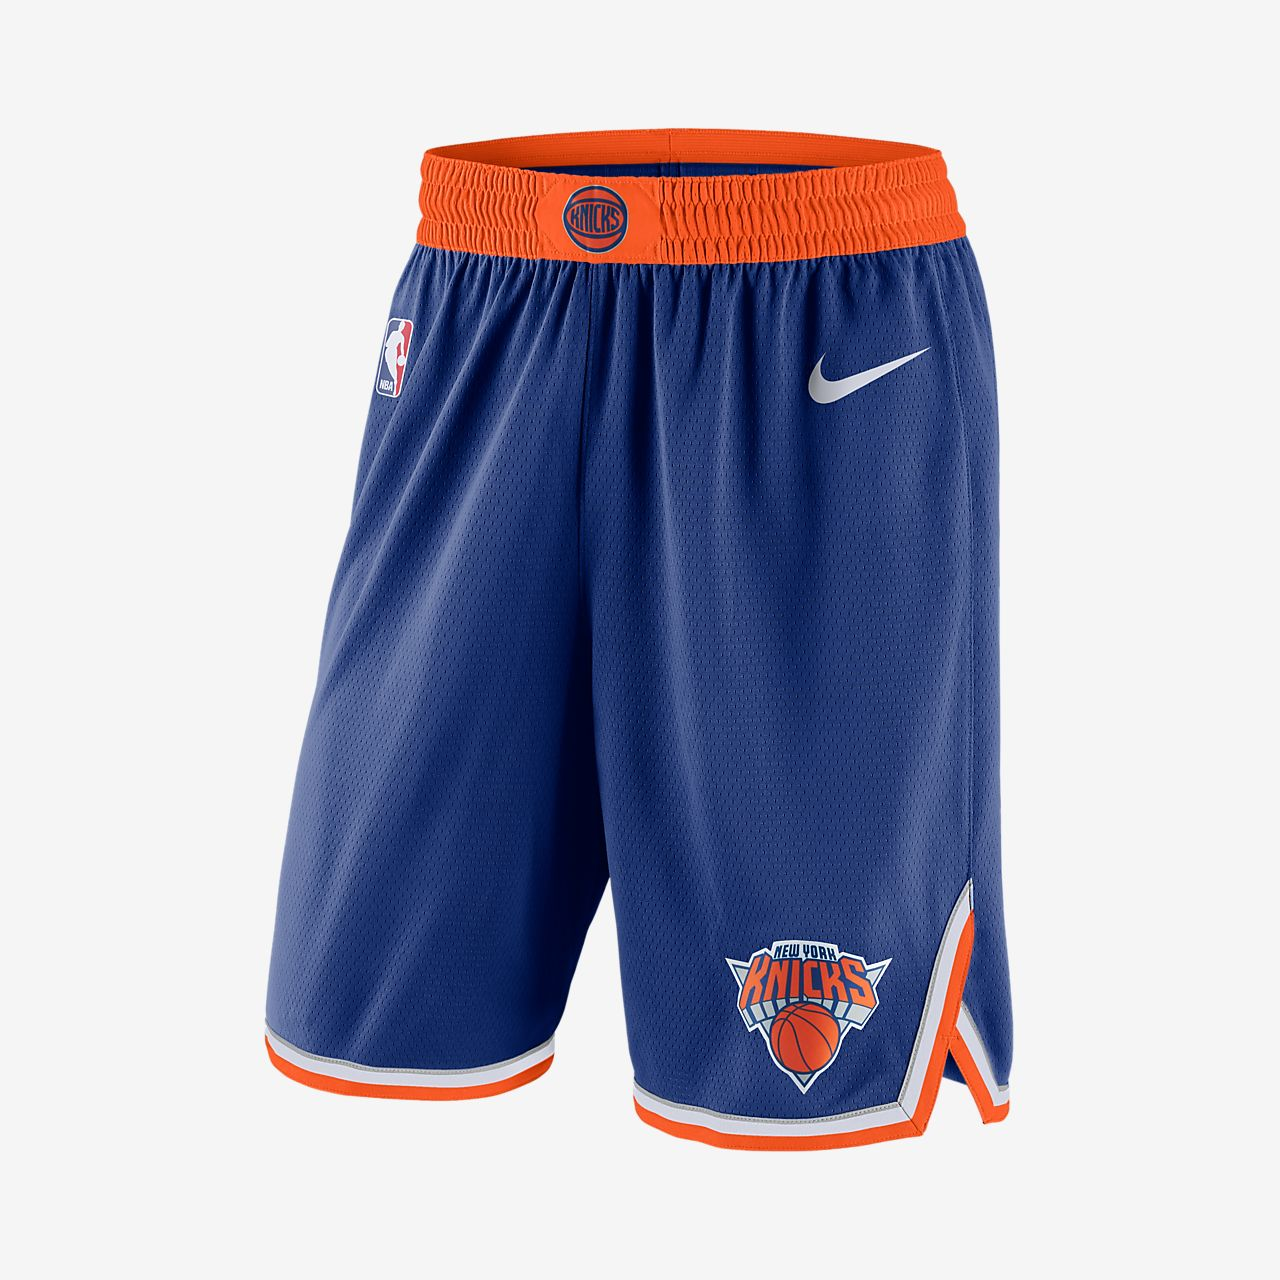 Short de NBA New York Knicks Nike Icon Edition Swingman pour Homme